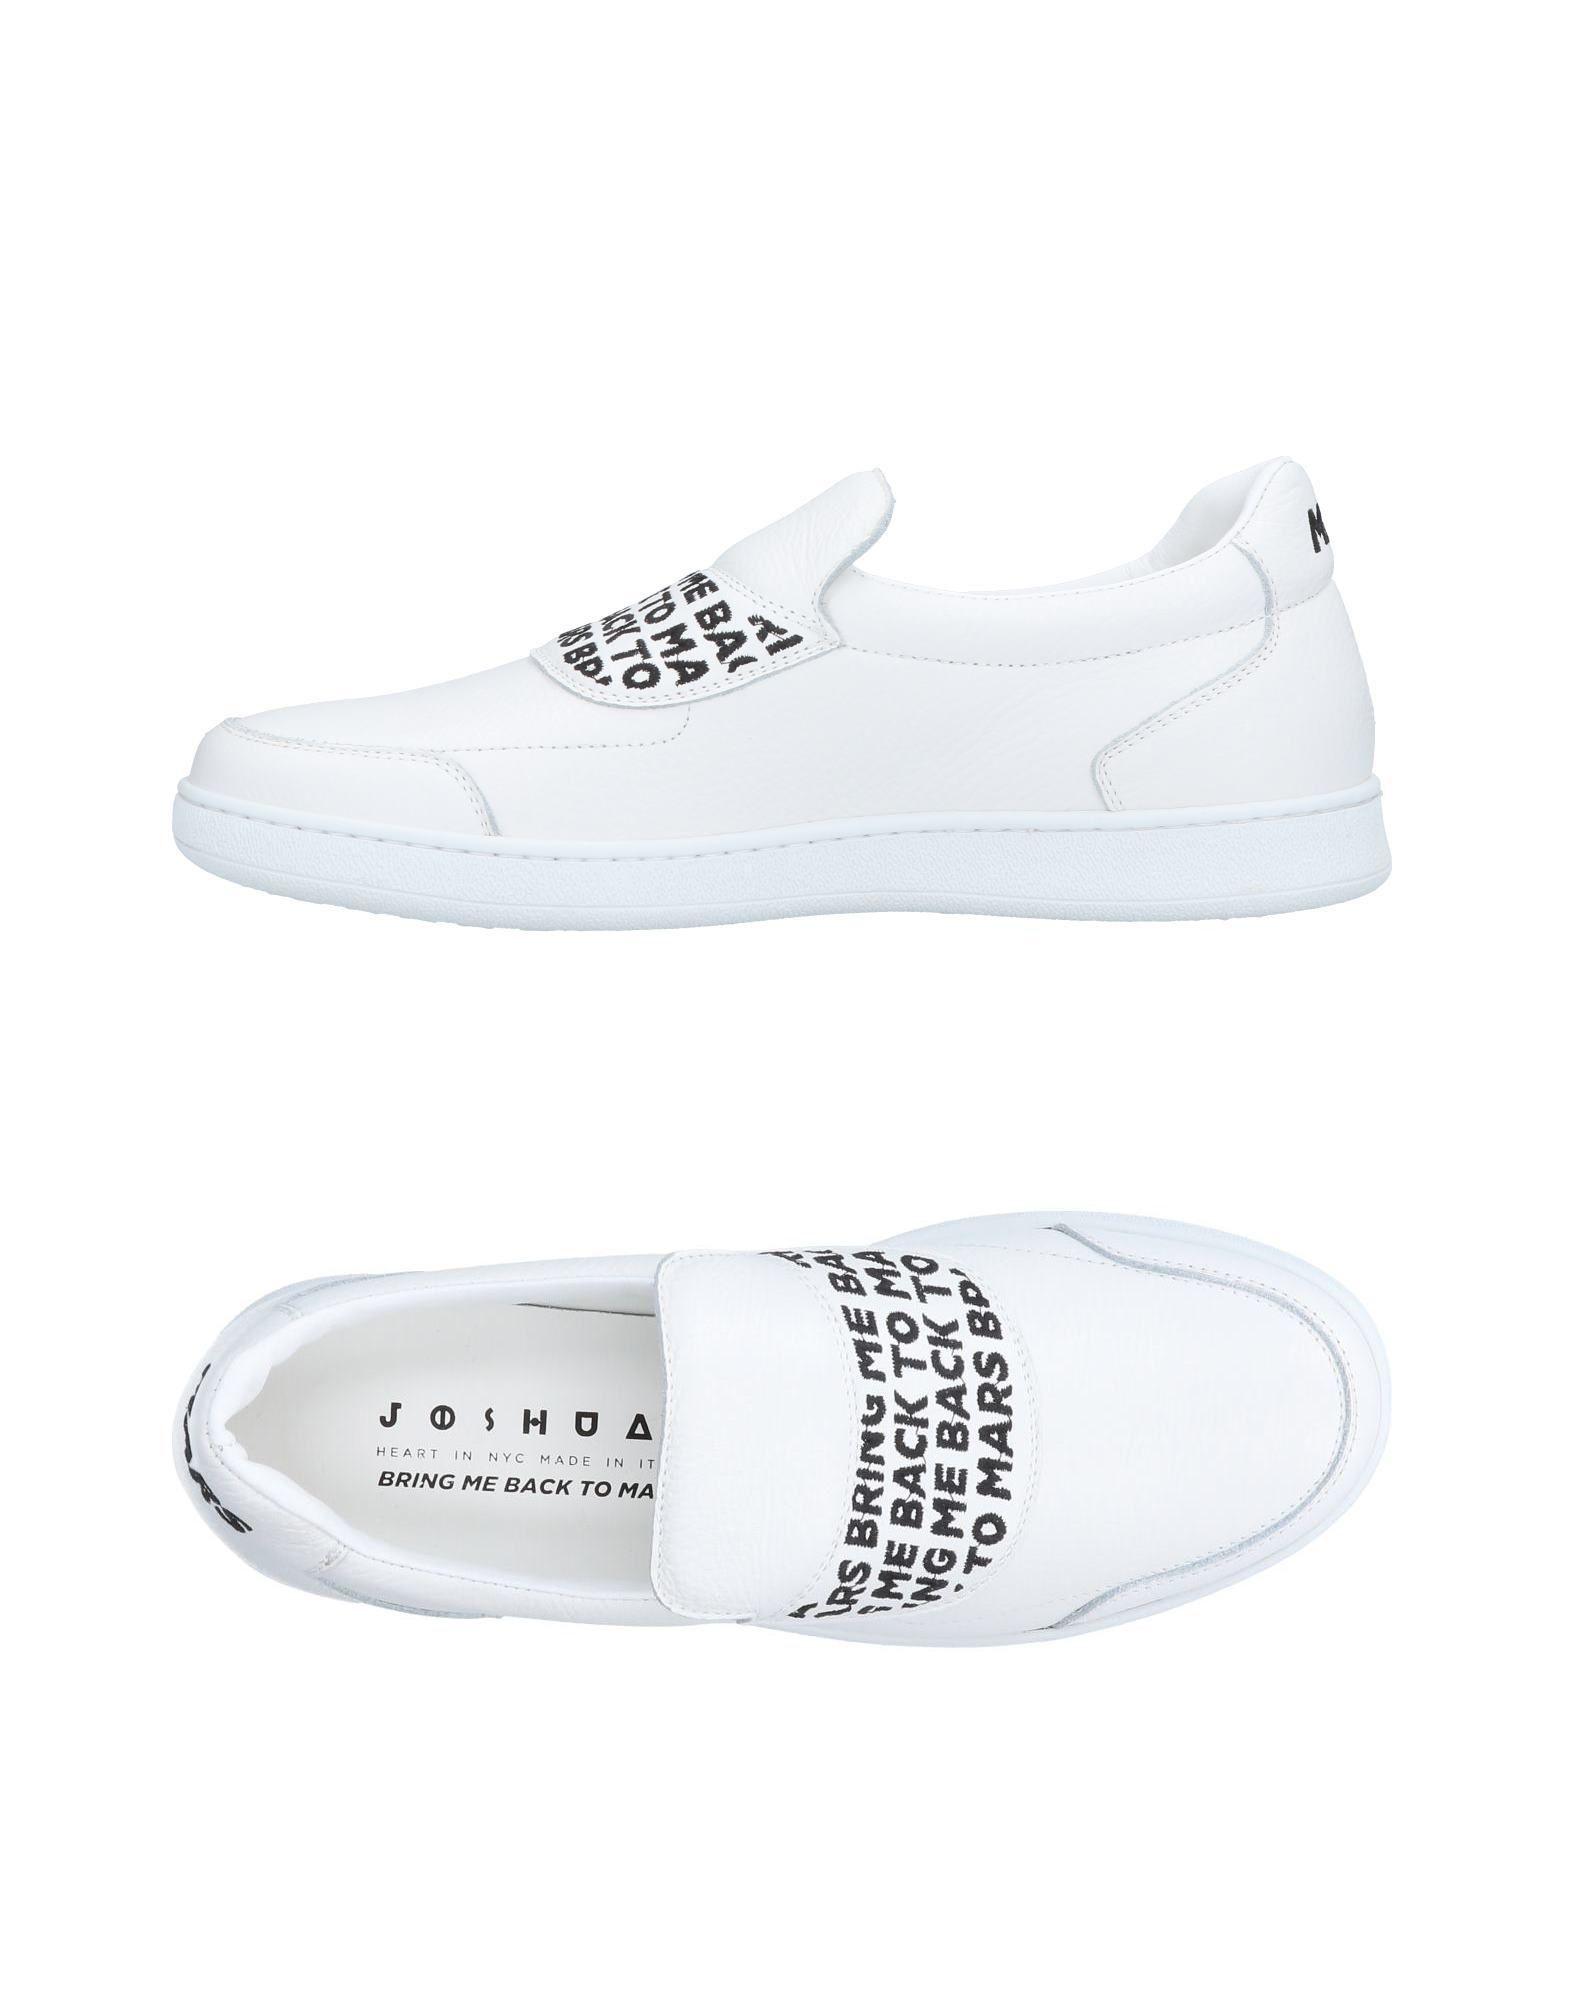 Joshua*S Sneakers - Men Joshua*S Sneakers online 11489022VN on  Australia - 11489022VN online 76fdce